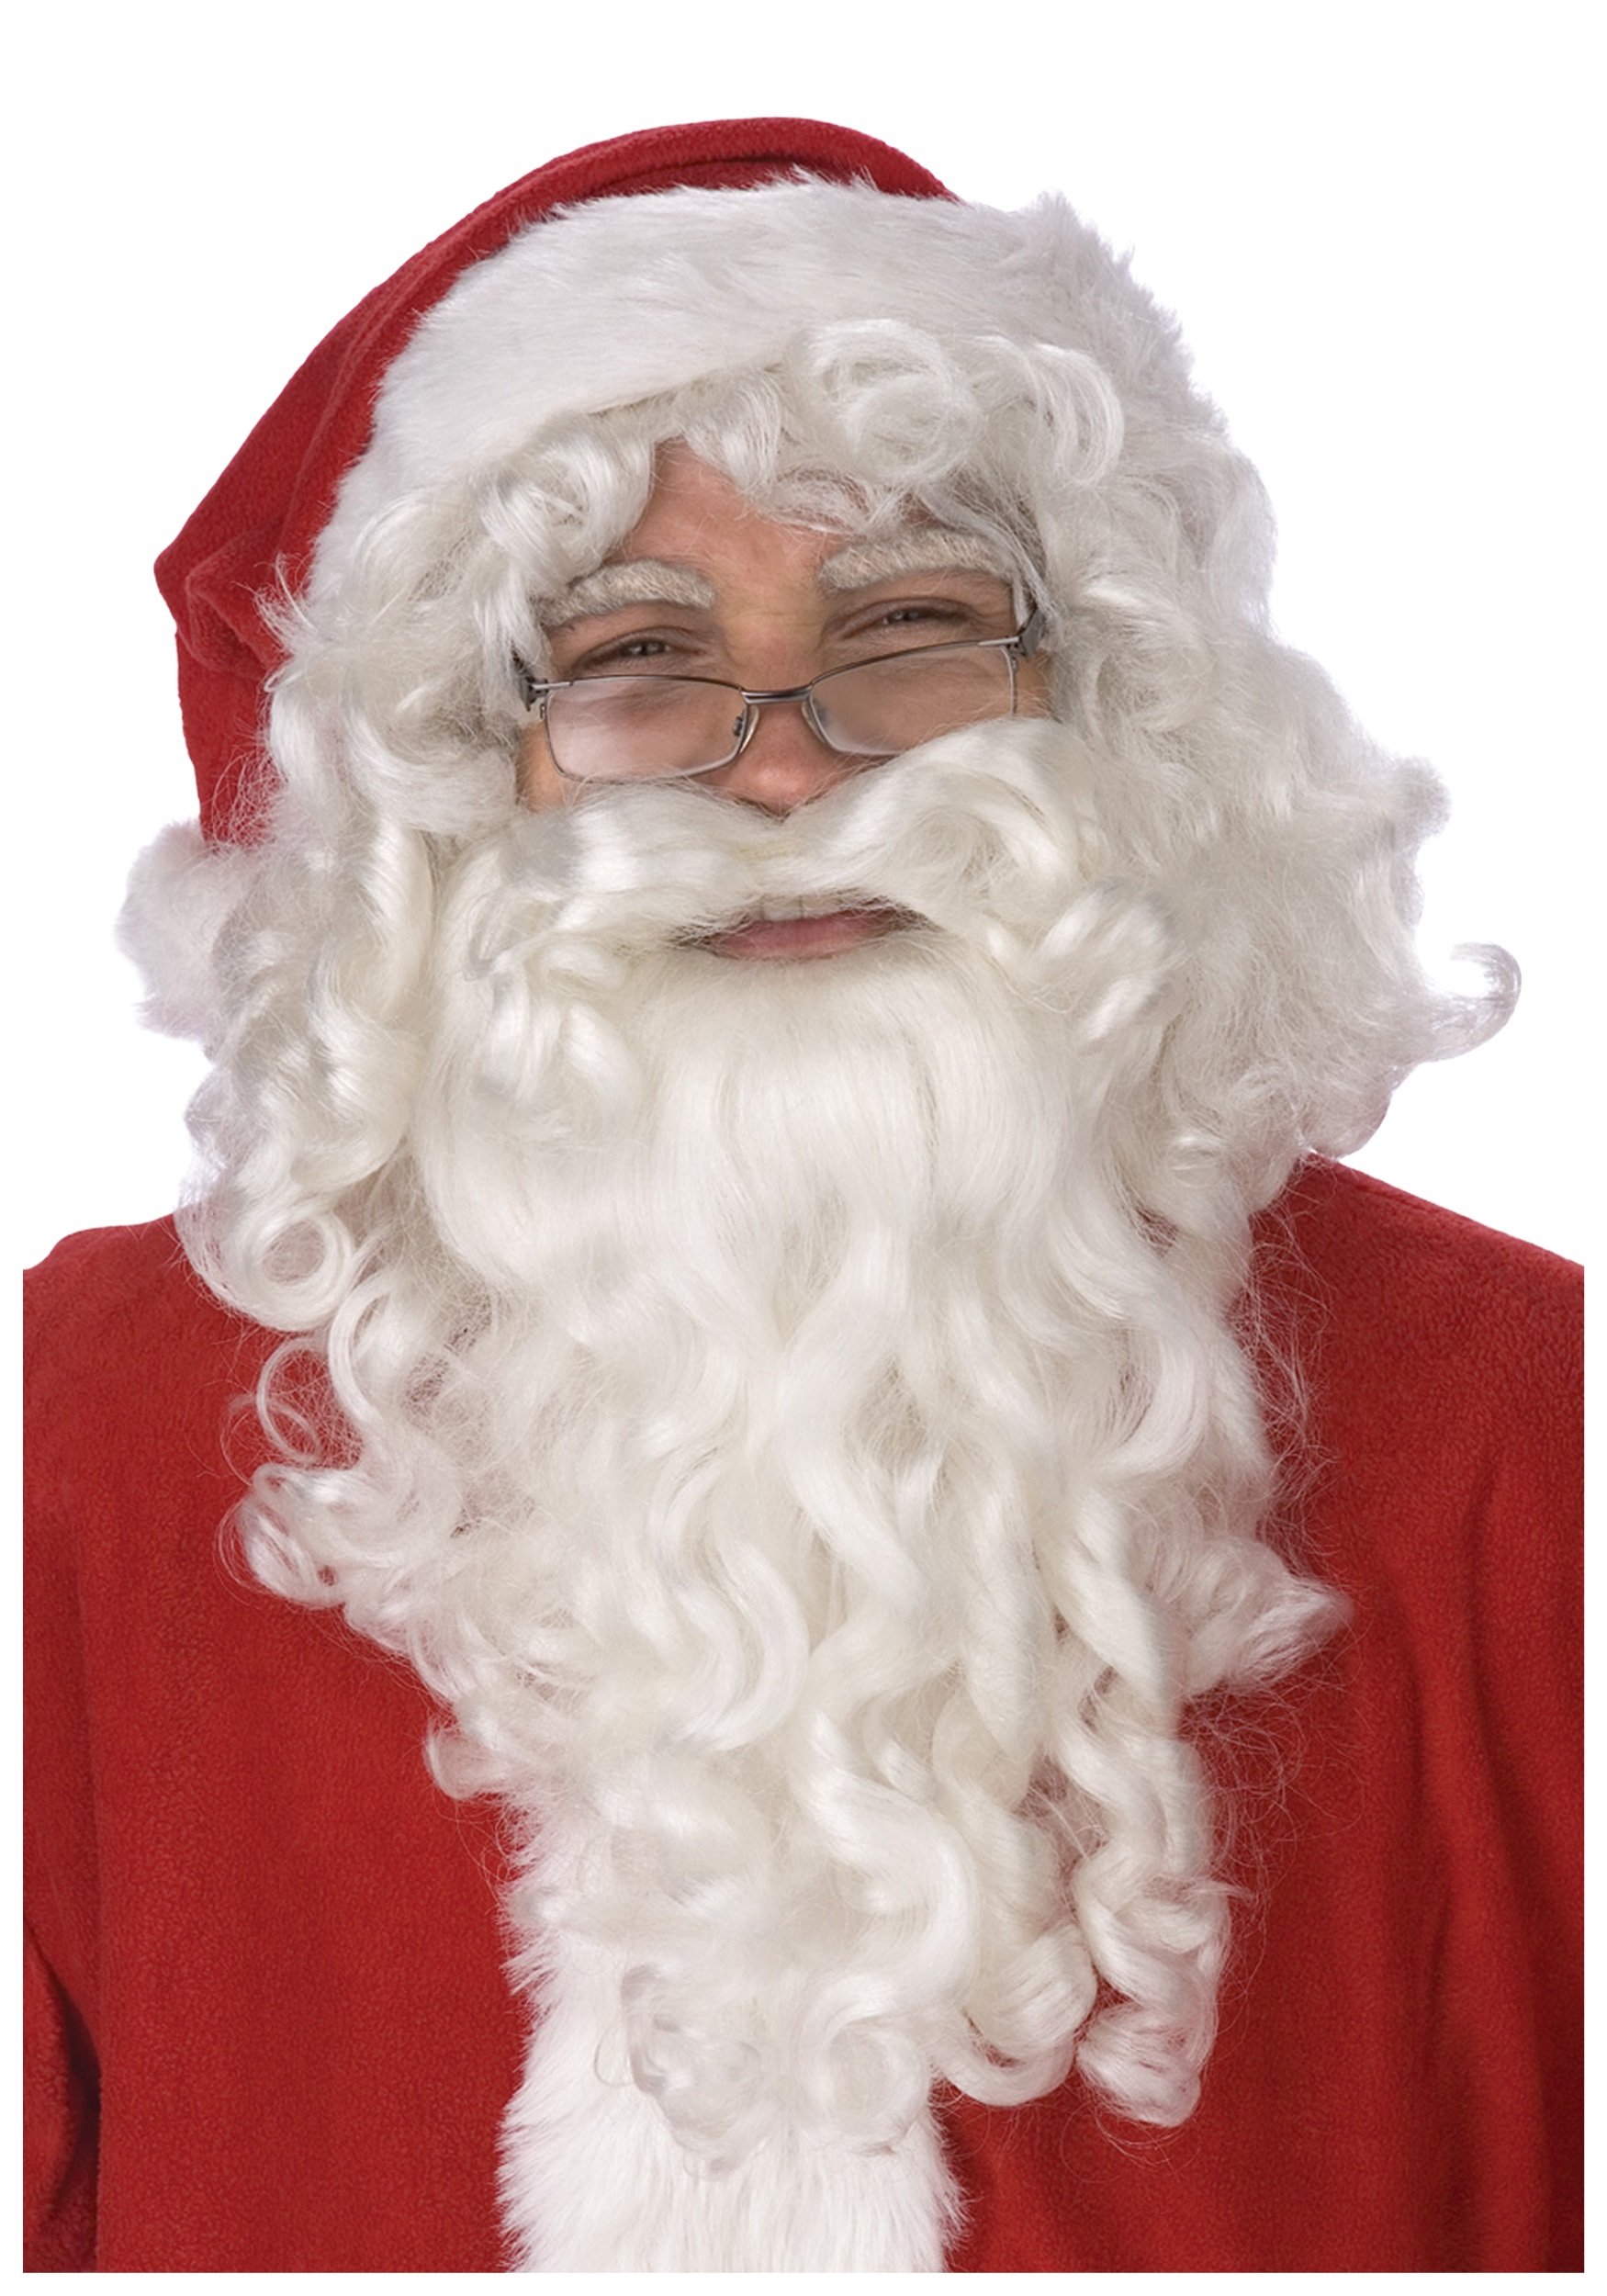 California Costumes Mens Santa Claus Beard and Wig Set